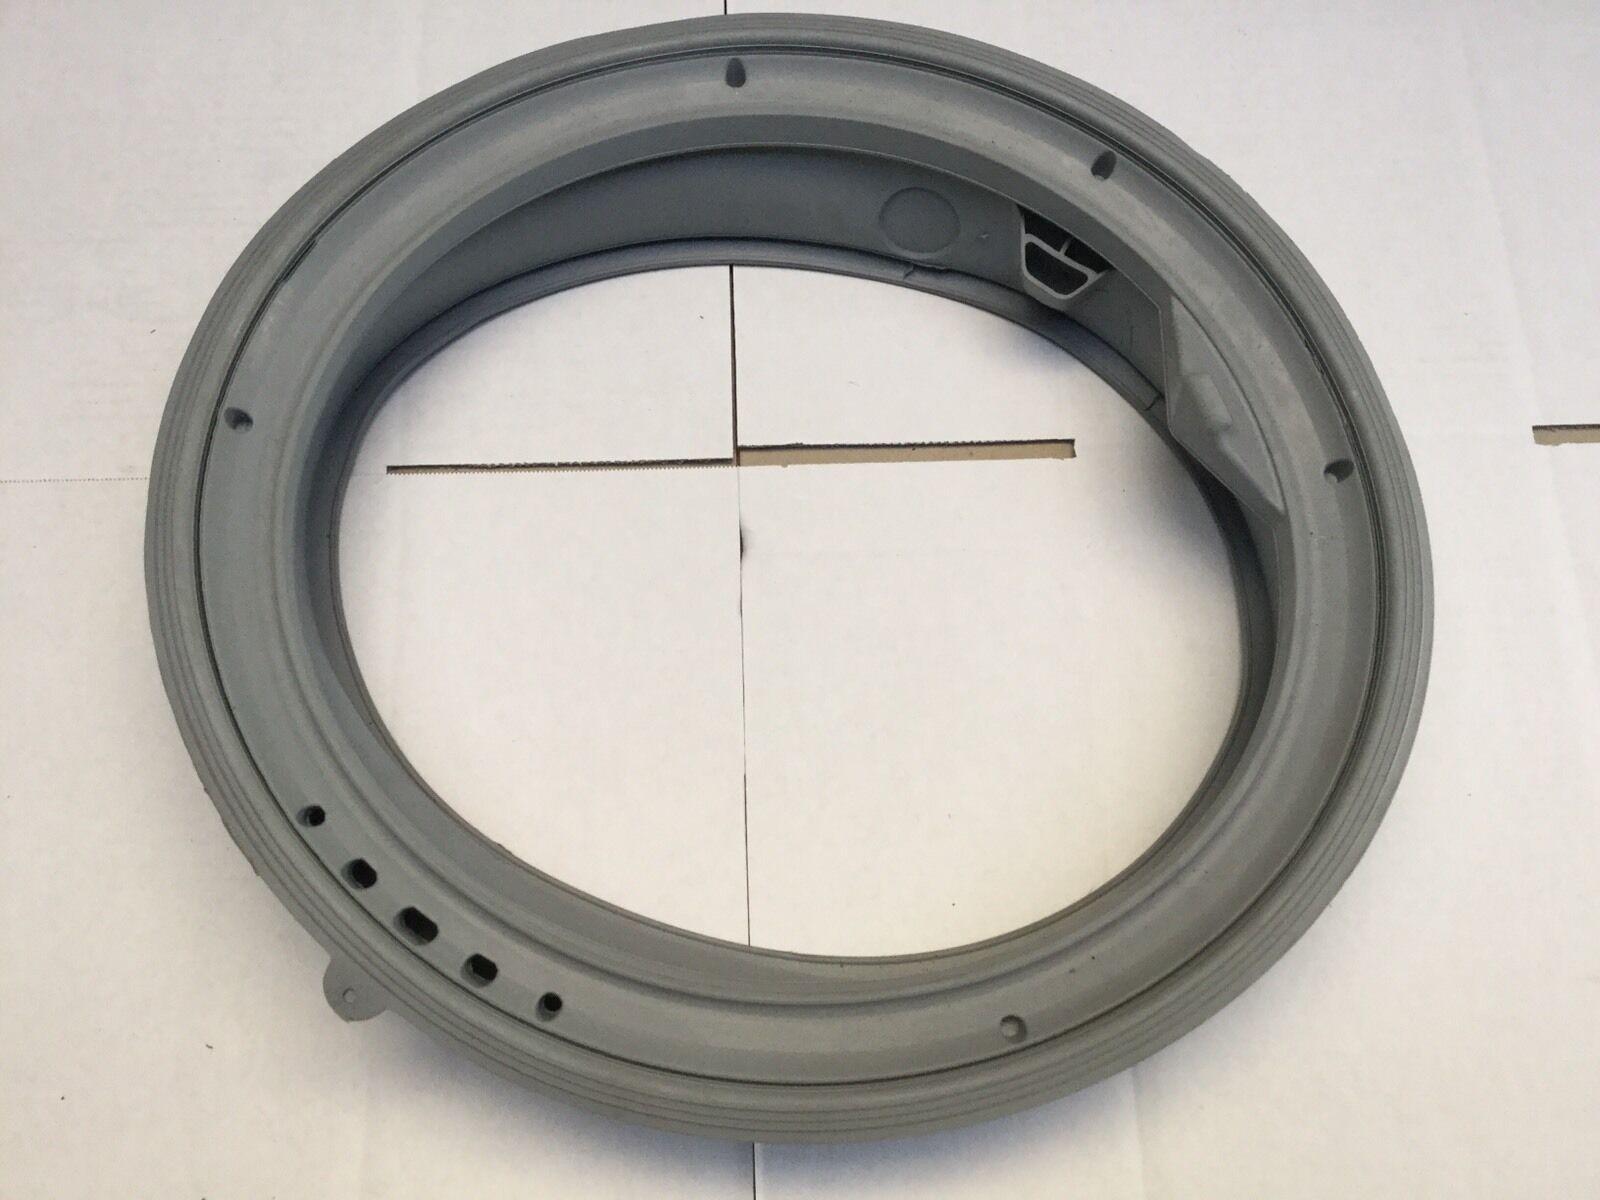 Genuine AEG LAVAMAT Washing Machine Door Boot Seal Gasket 72630-W LAV72630-W